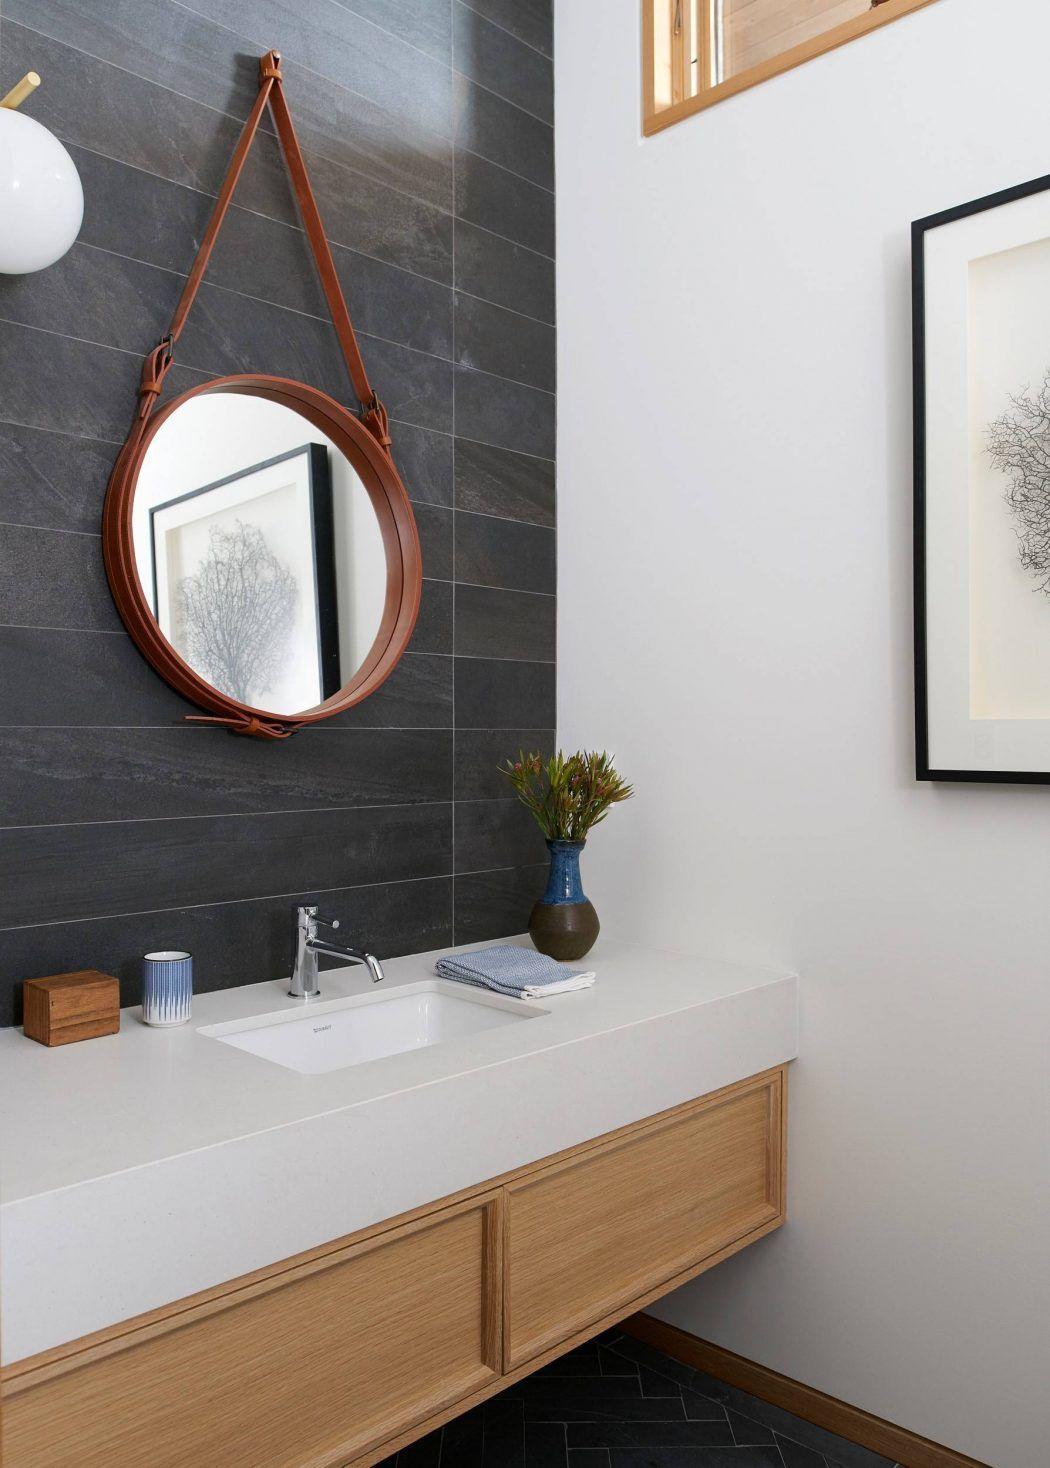 Bathroom Design Centres Toronto Bathroom Design Companies Toronto ...